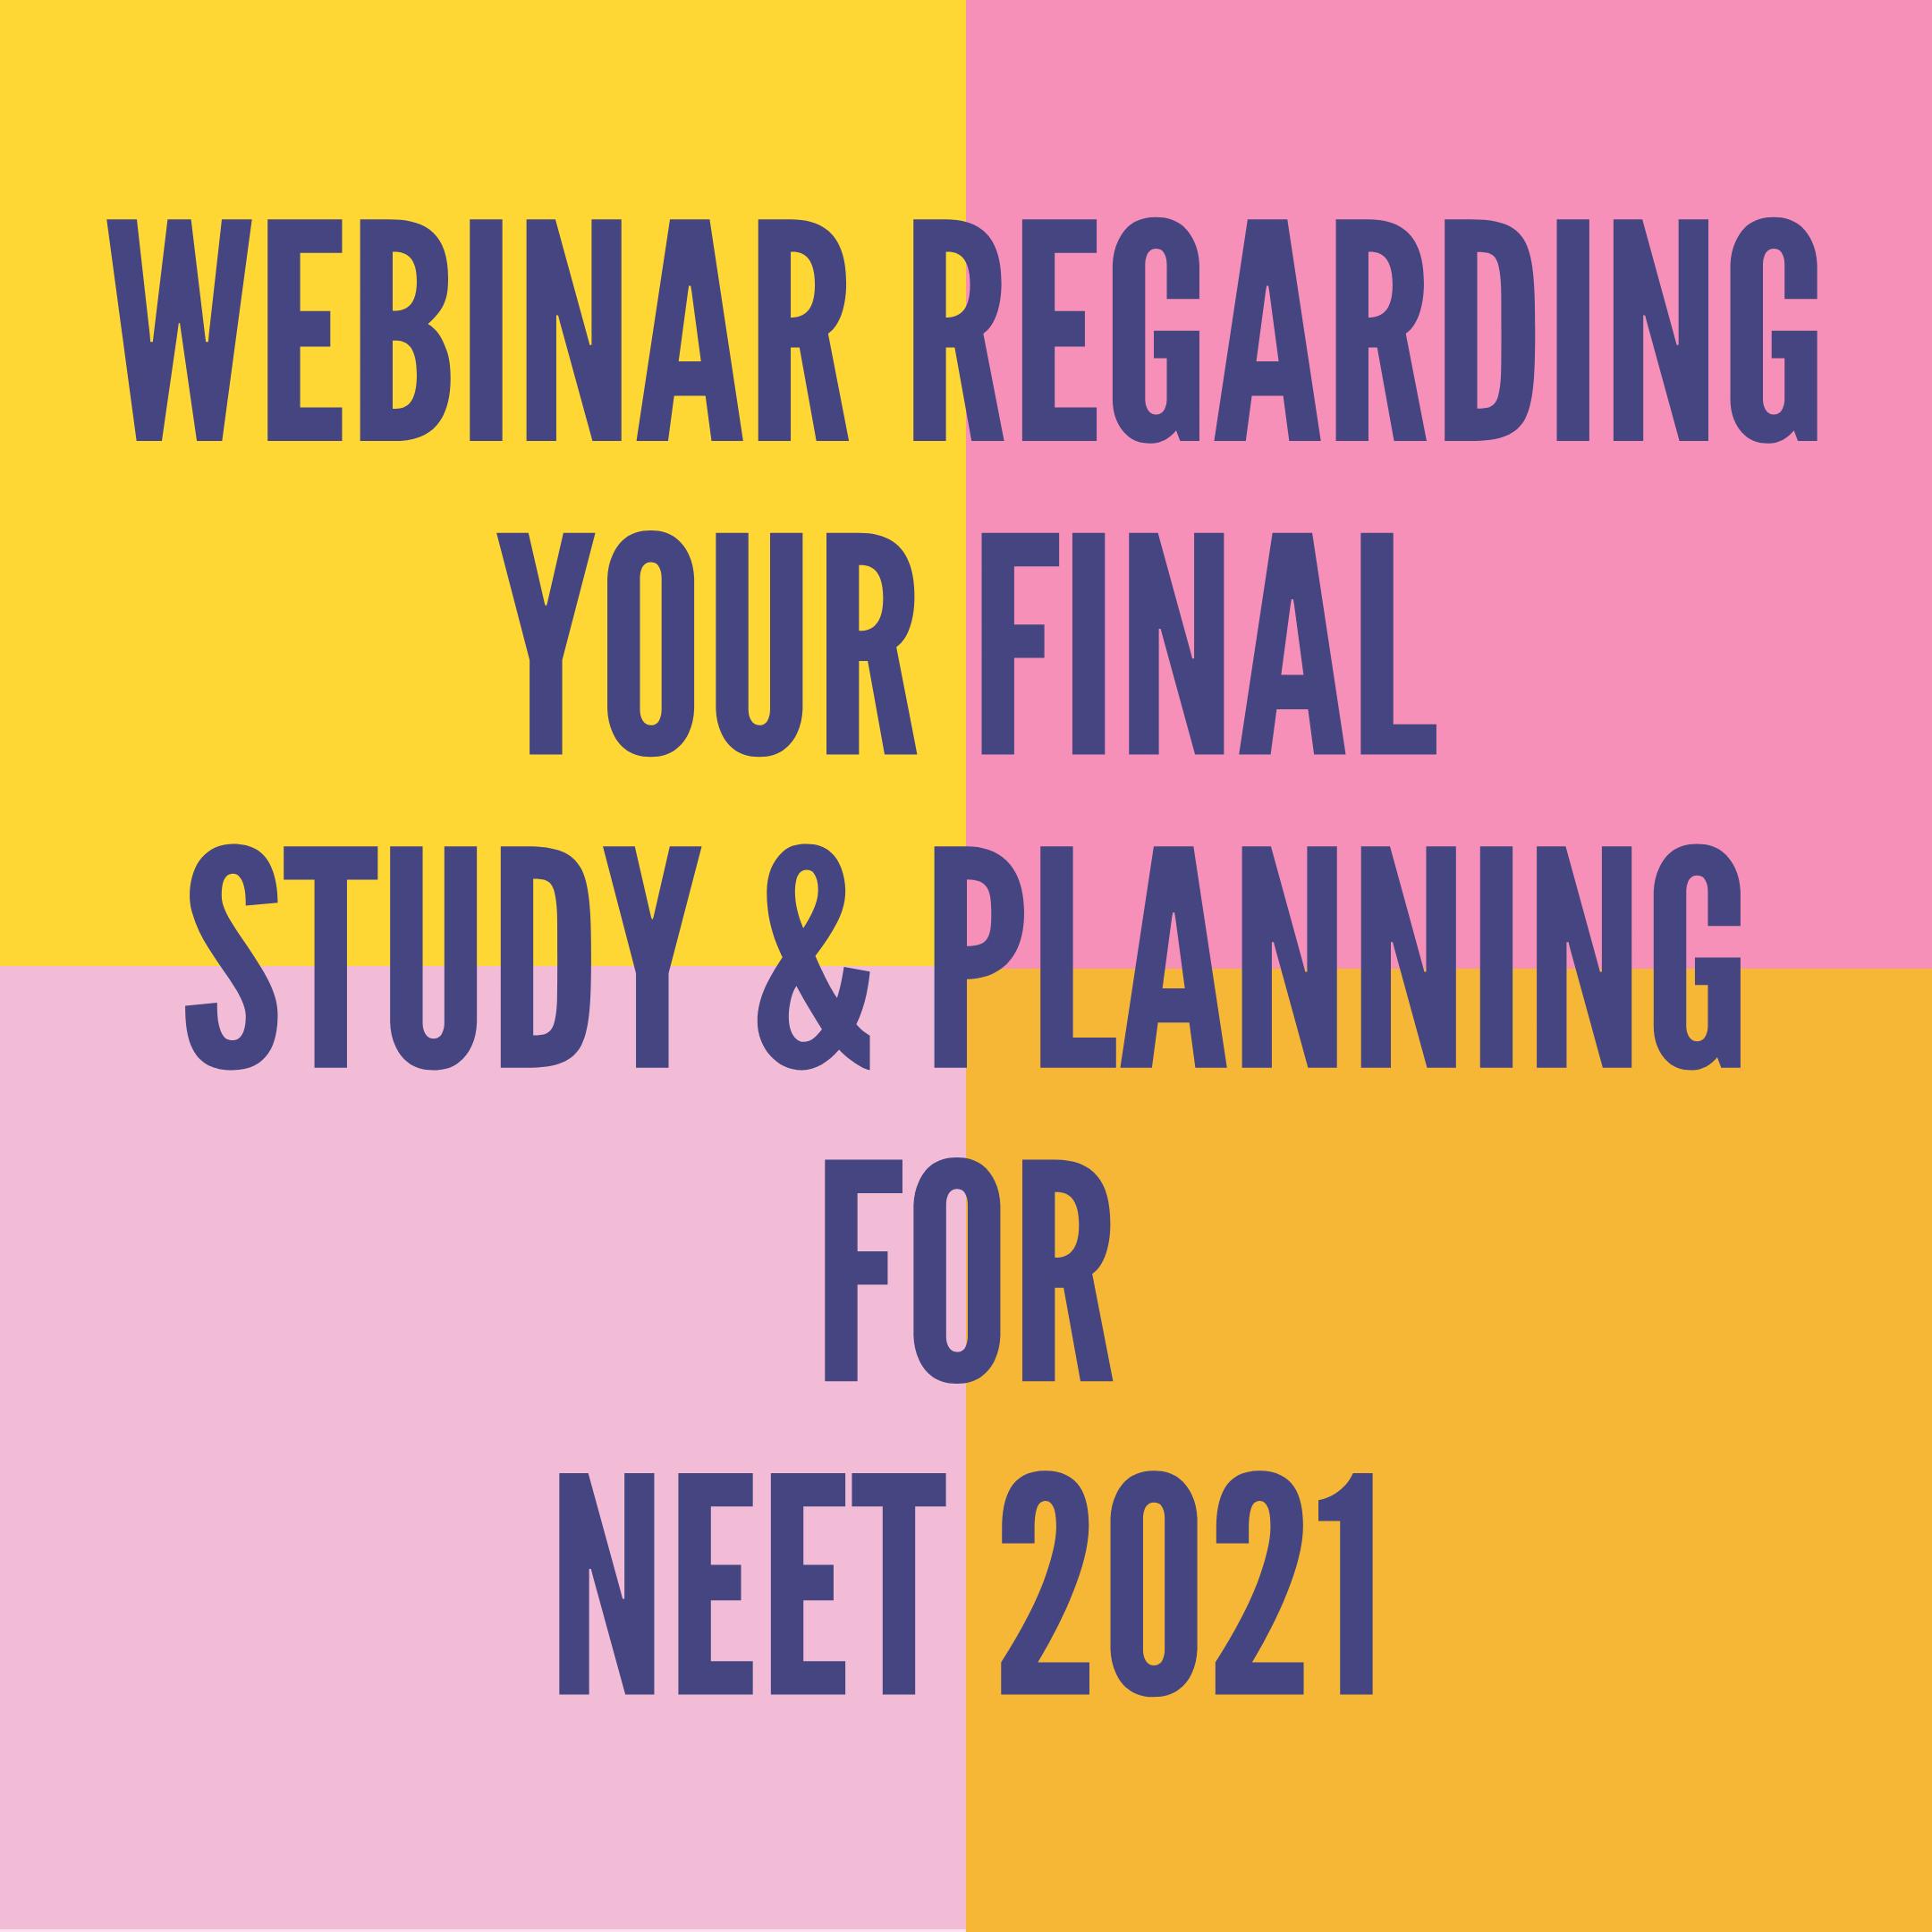 WEBINAR REGARDING YOUR FINAL STUDY & PLANNING FOR NEET 2021